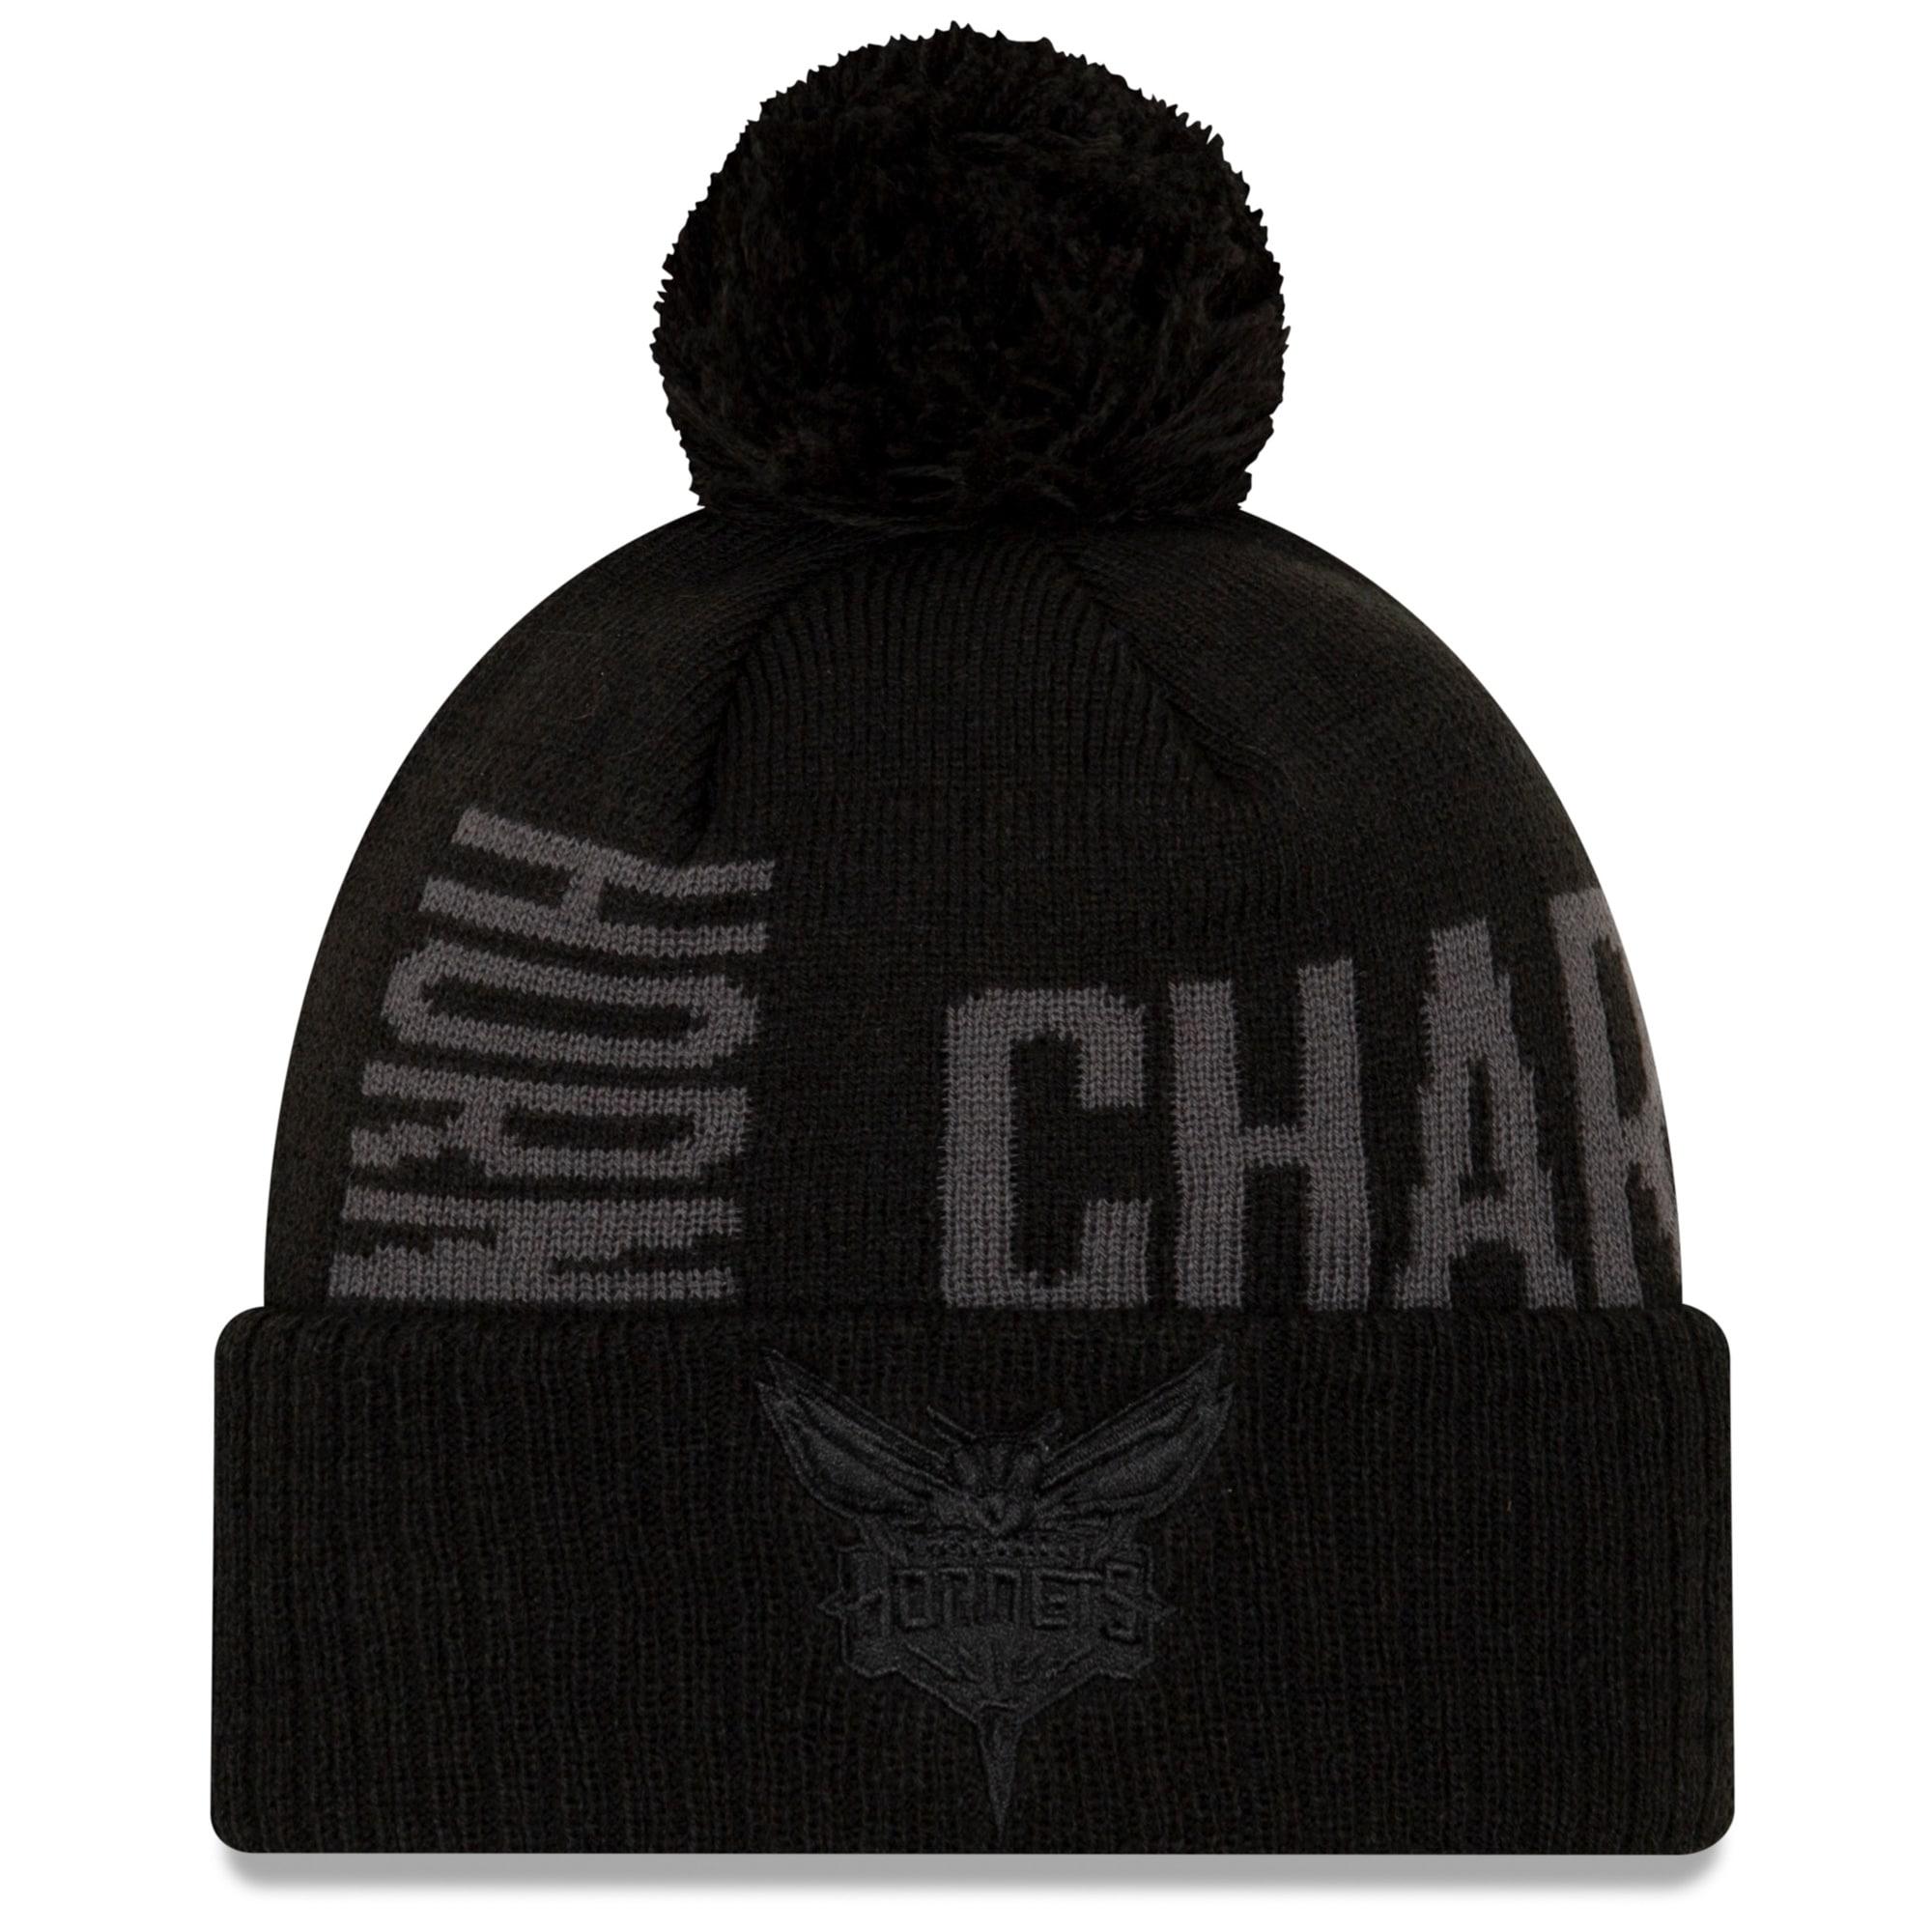 Charlotte Hornets New Era 2019 NBA Tip-Off Series Tonal Cuffed Knit Hat - Black